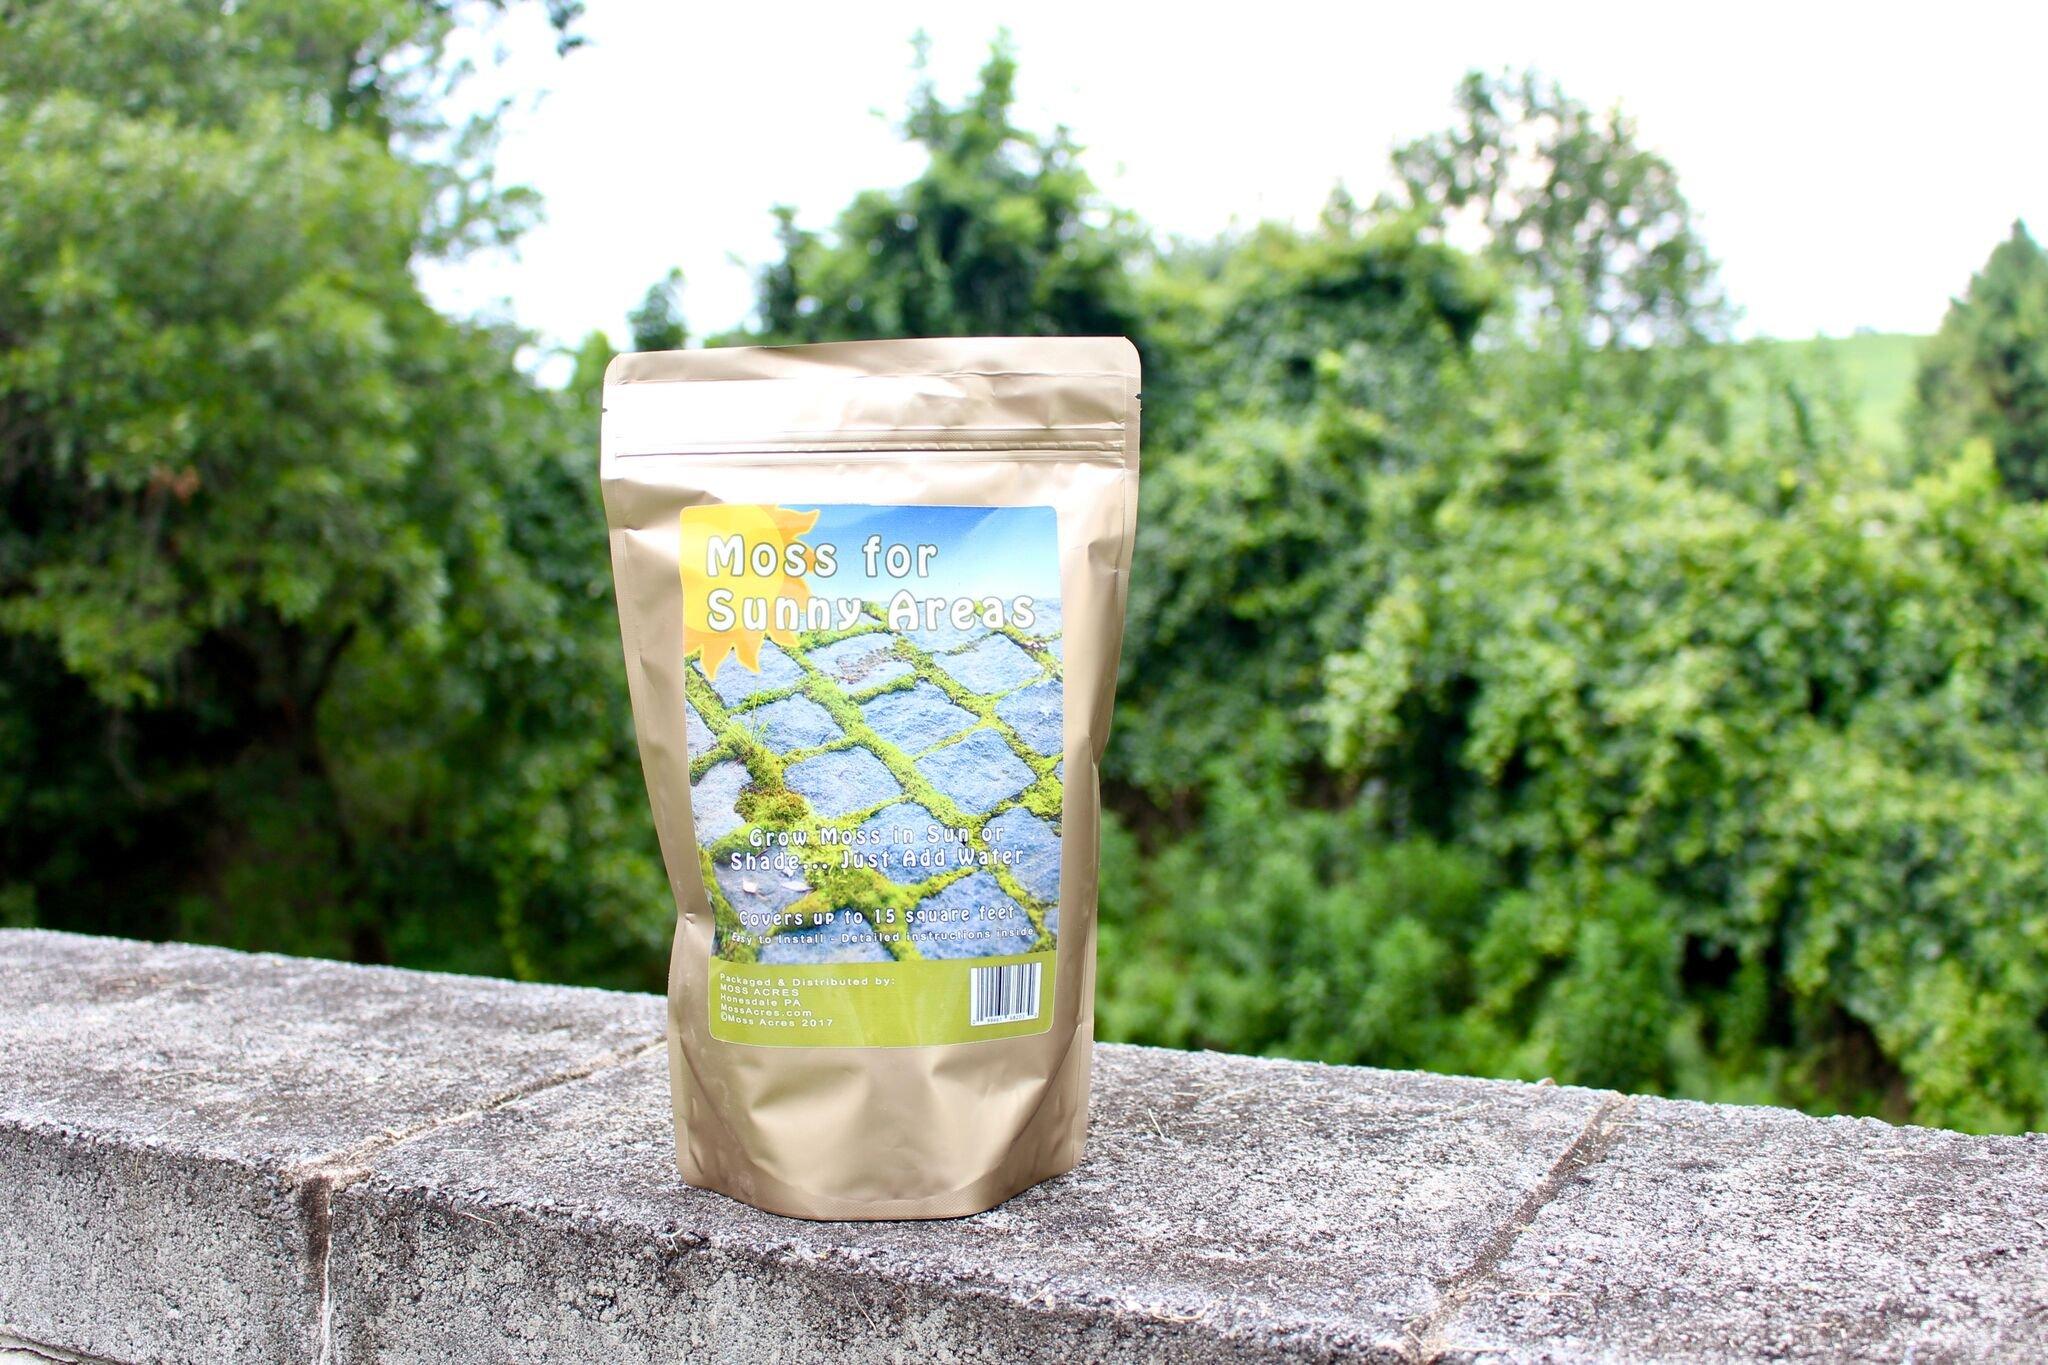 Moss Acres New! Moss for Sunny Areas – Sun-Tolerant Moss Milkshake Pre-Ground Bryum Caespiticium Fragments – 28 oz.